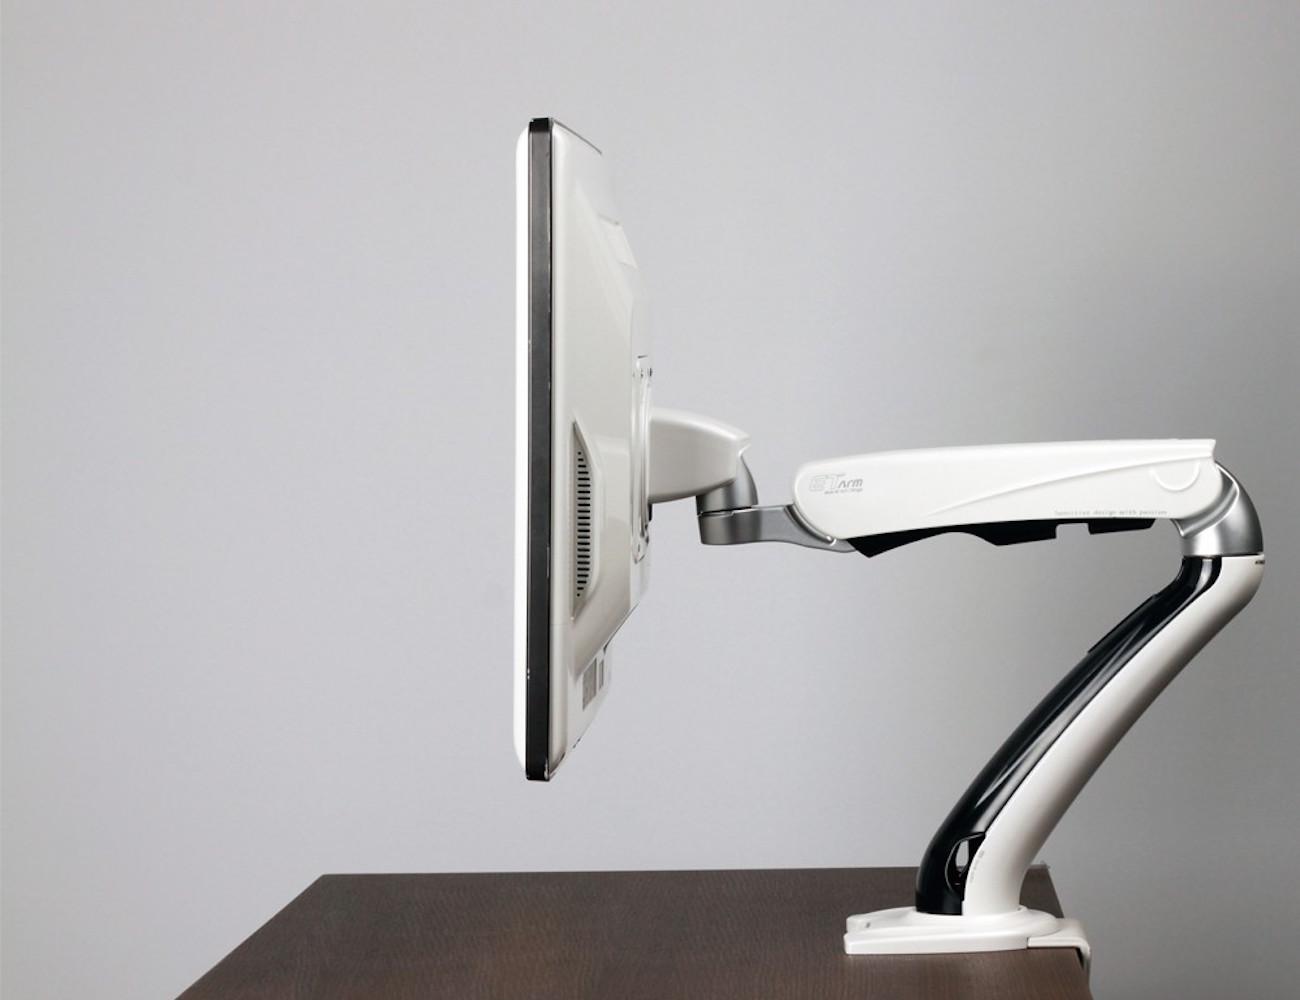 Satechi Ergonomic LCD Arm Desk Clamp Mount